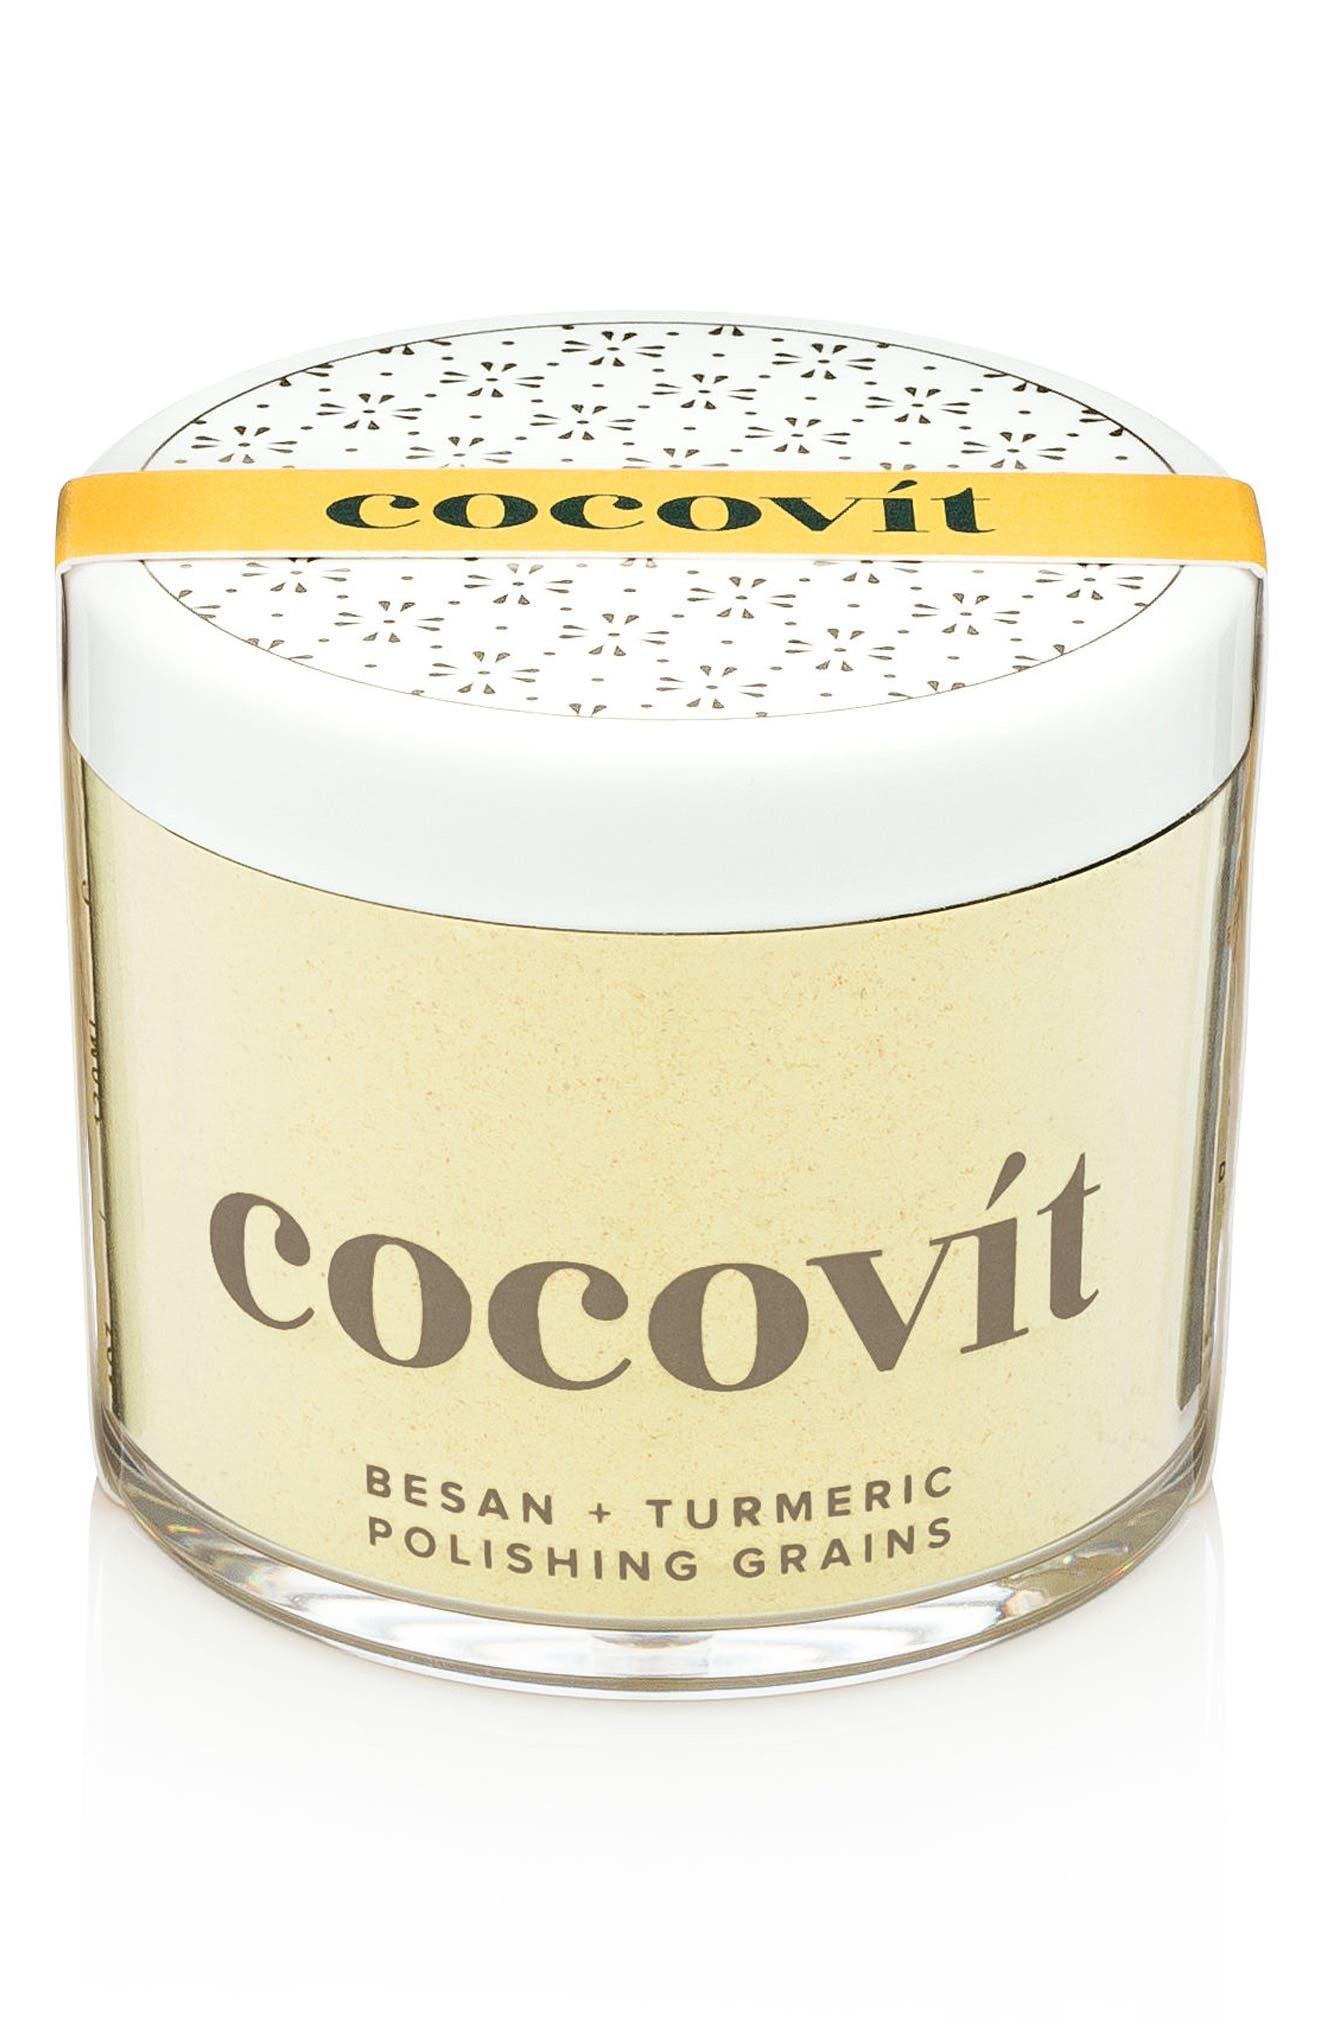 COCOVIT,                             Besan + Turmeric Polishing Grains,                             Main thumbnail 1, color,                             000